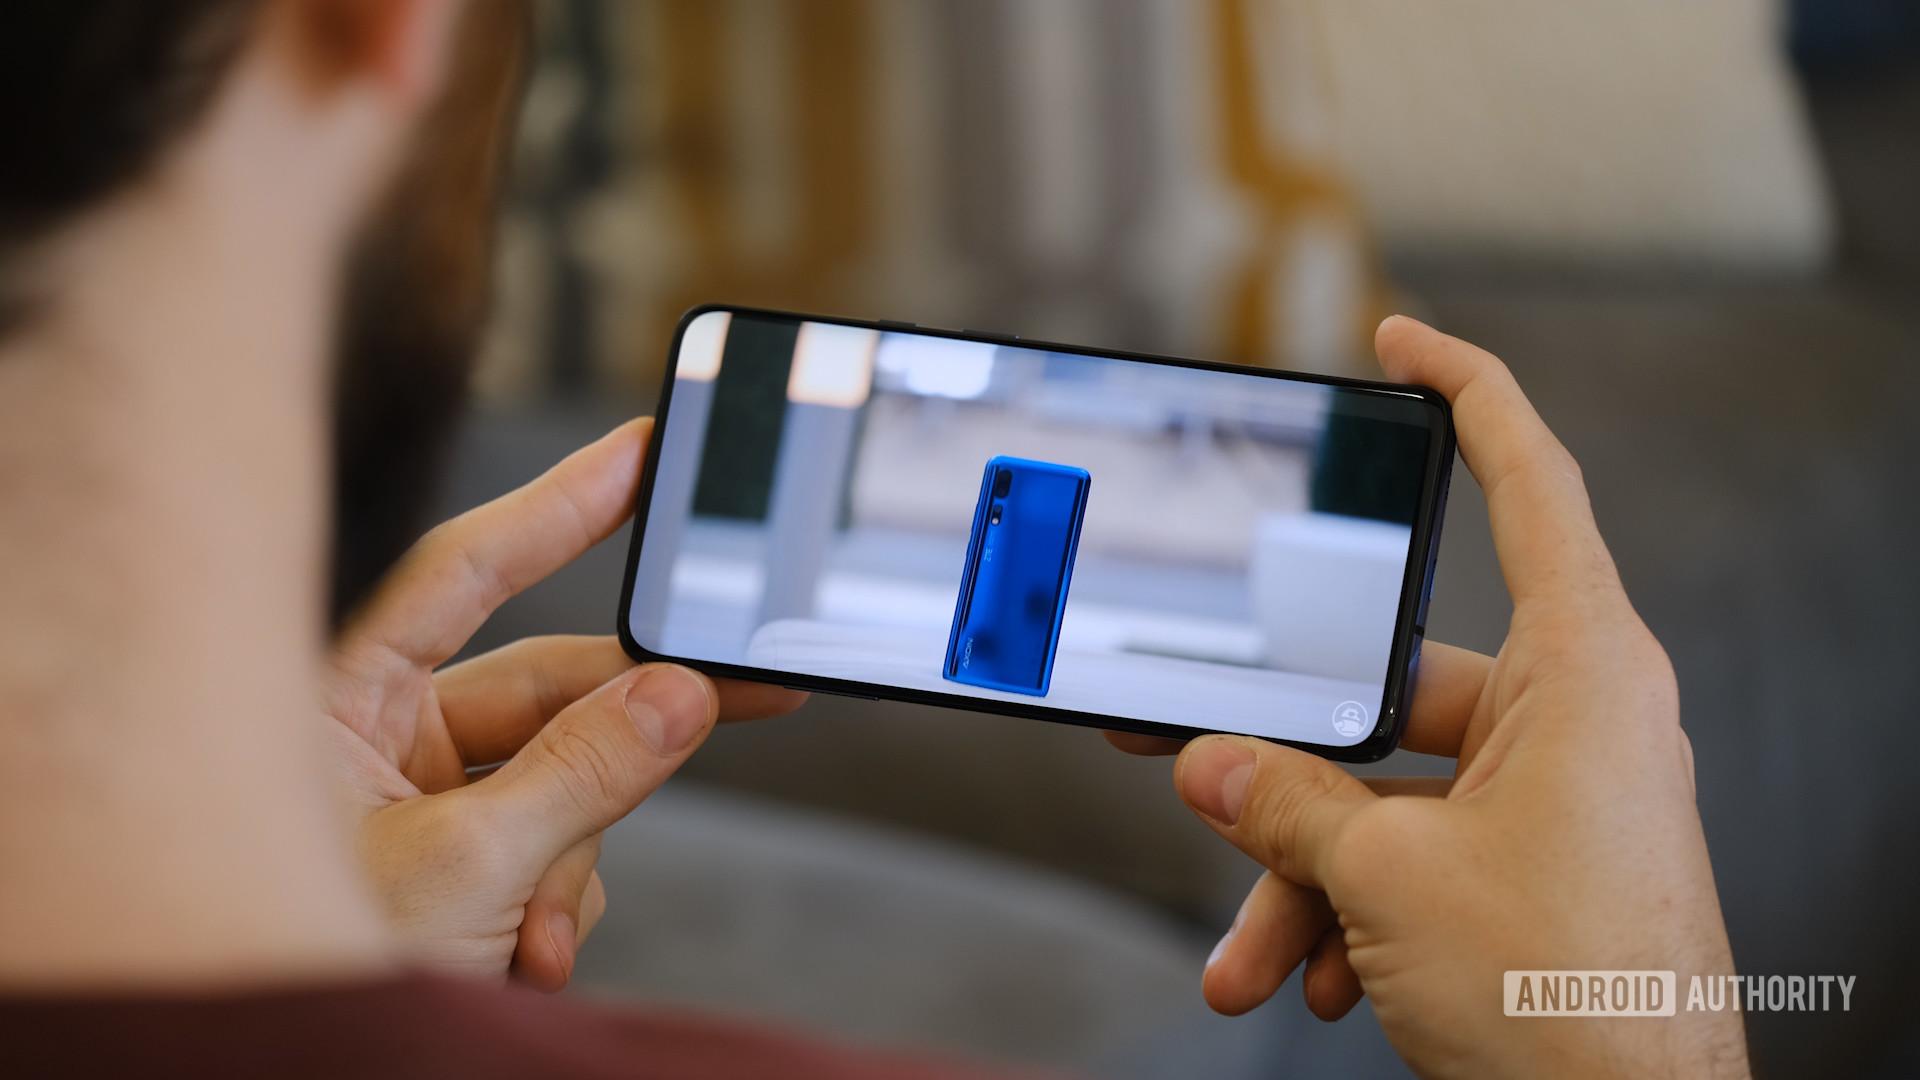 OnePlus 7 Pro wathing YouTube video